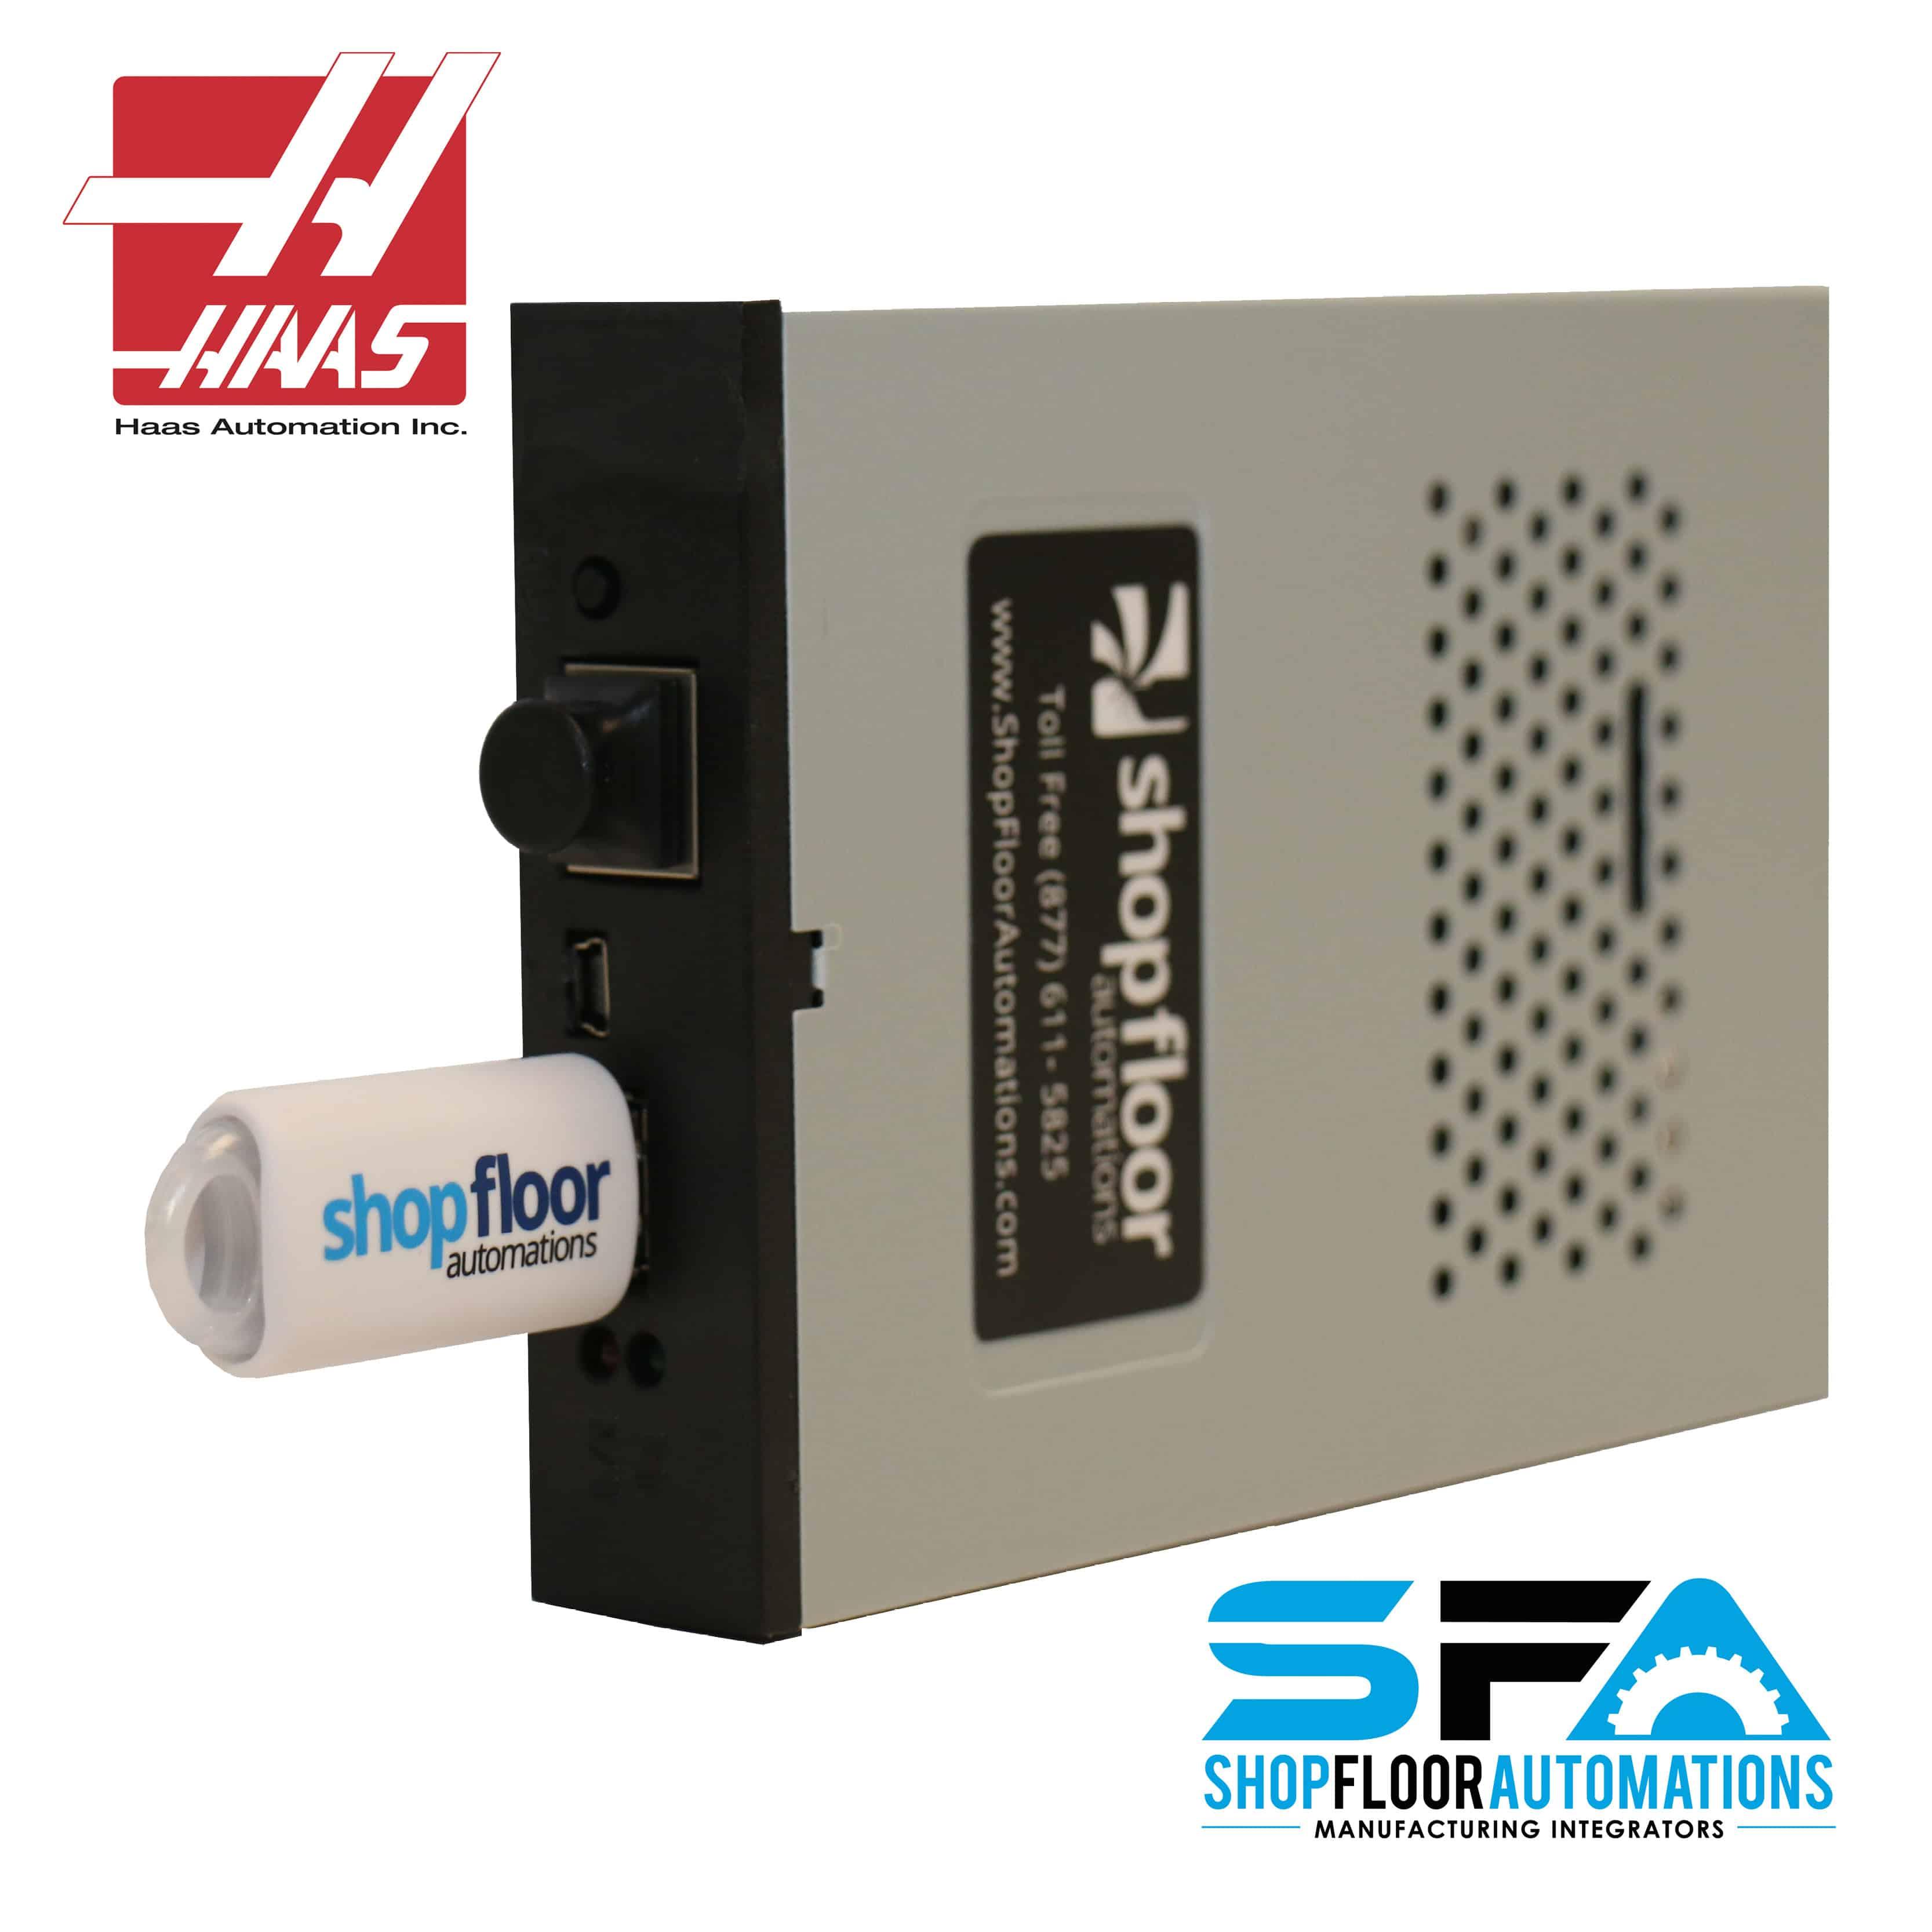 Haas Floppy Drive Emulator